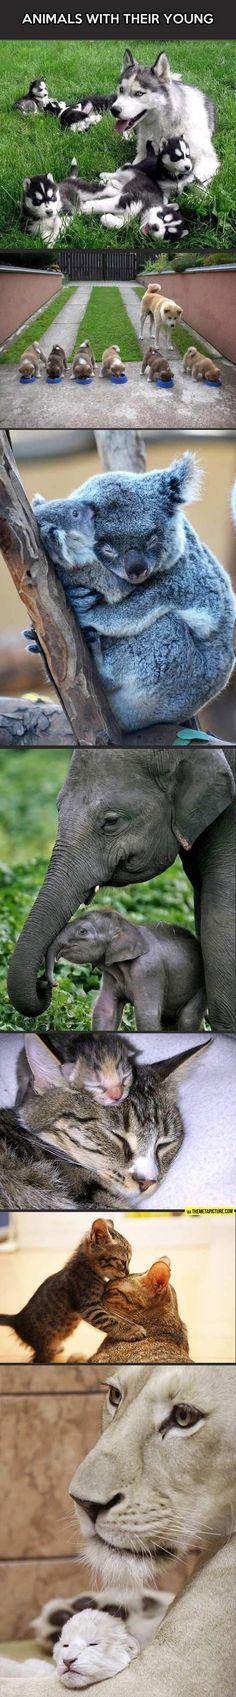 Animals With Their Young love cute animals adorable animal pets wild animals Cute Funny Animals, Cute Baby Animals, Animals And Pets, Wild Animals, Funny Koala, Animal Babies, Koala Meme, Nature Animals, Cute Creatures